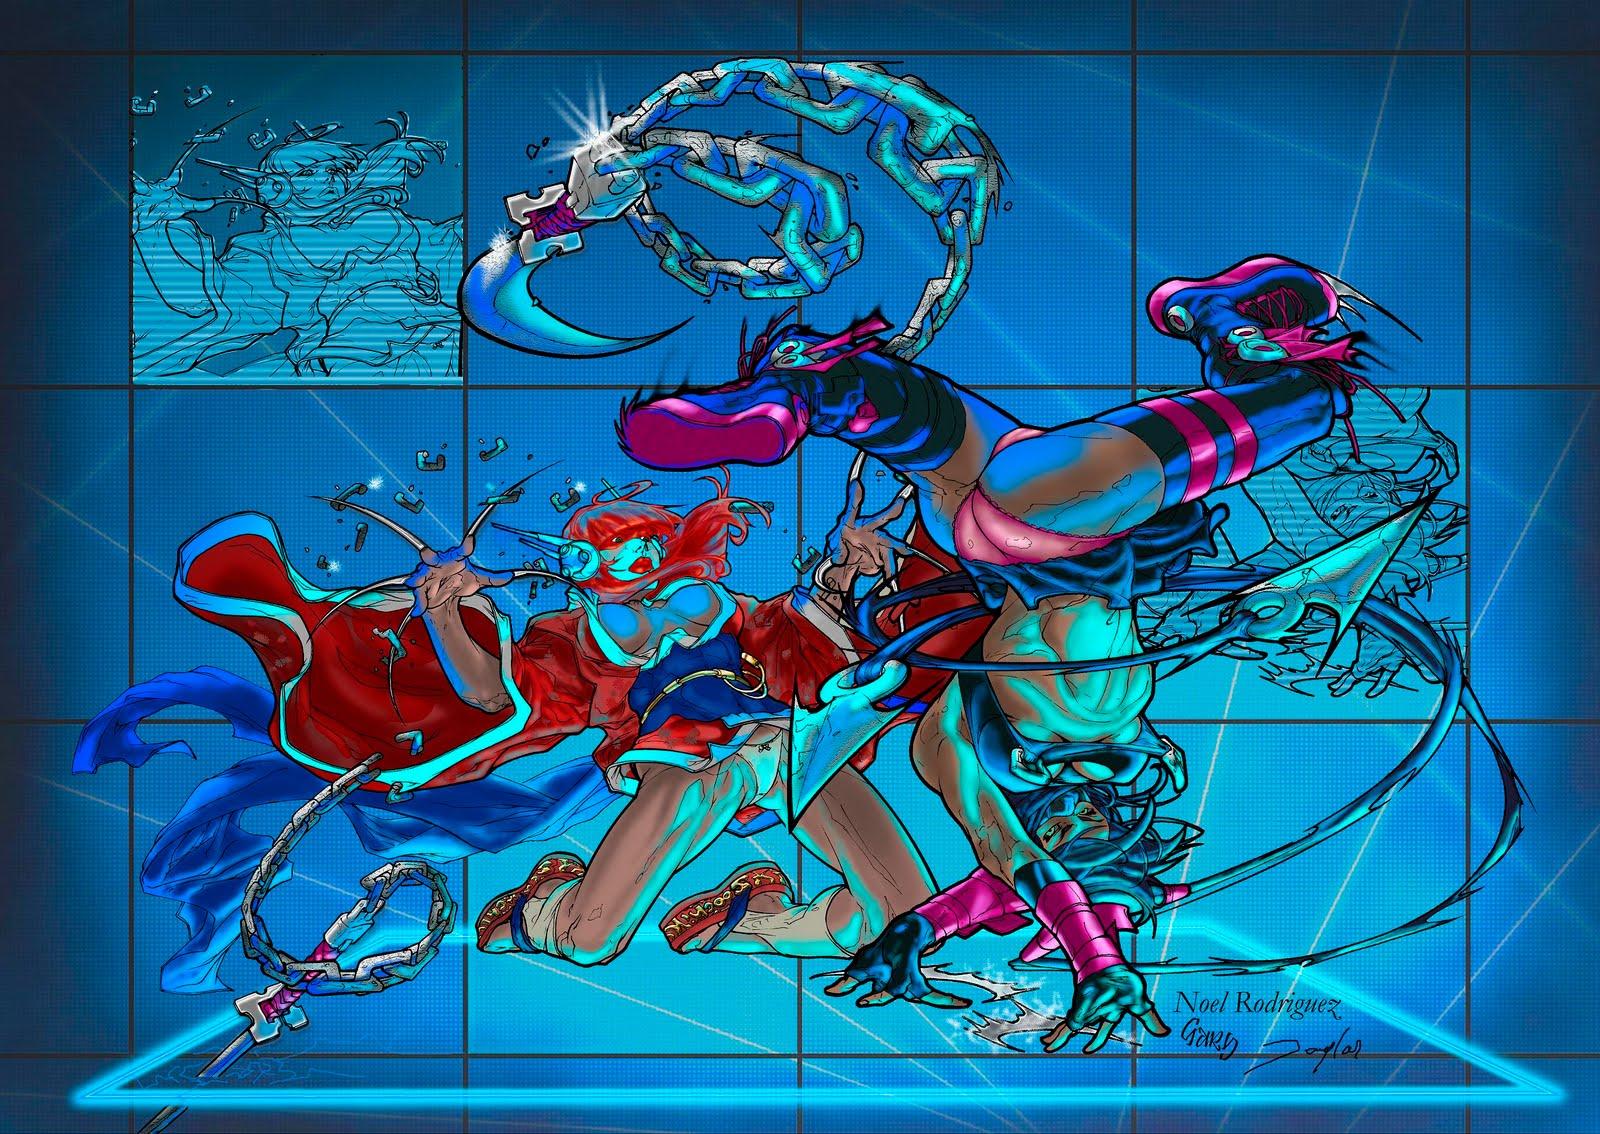 http://2.bp.blogspot.com/-zFNoPp8GPwI/TaYQ-zJCdpI/AAAAAAAAY50/E3BFF1uHoy8/s1600/colorbattle_scoochi_v__goh_goh_by_crayola_madness-d3aq8i9.jpg